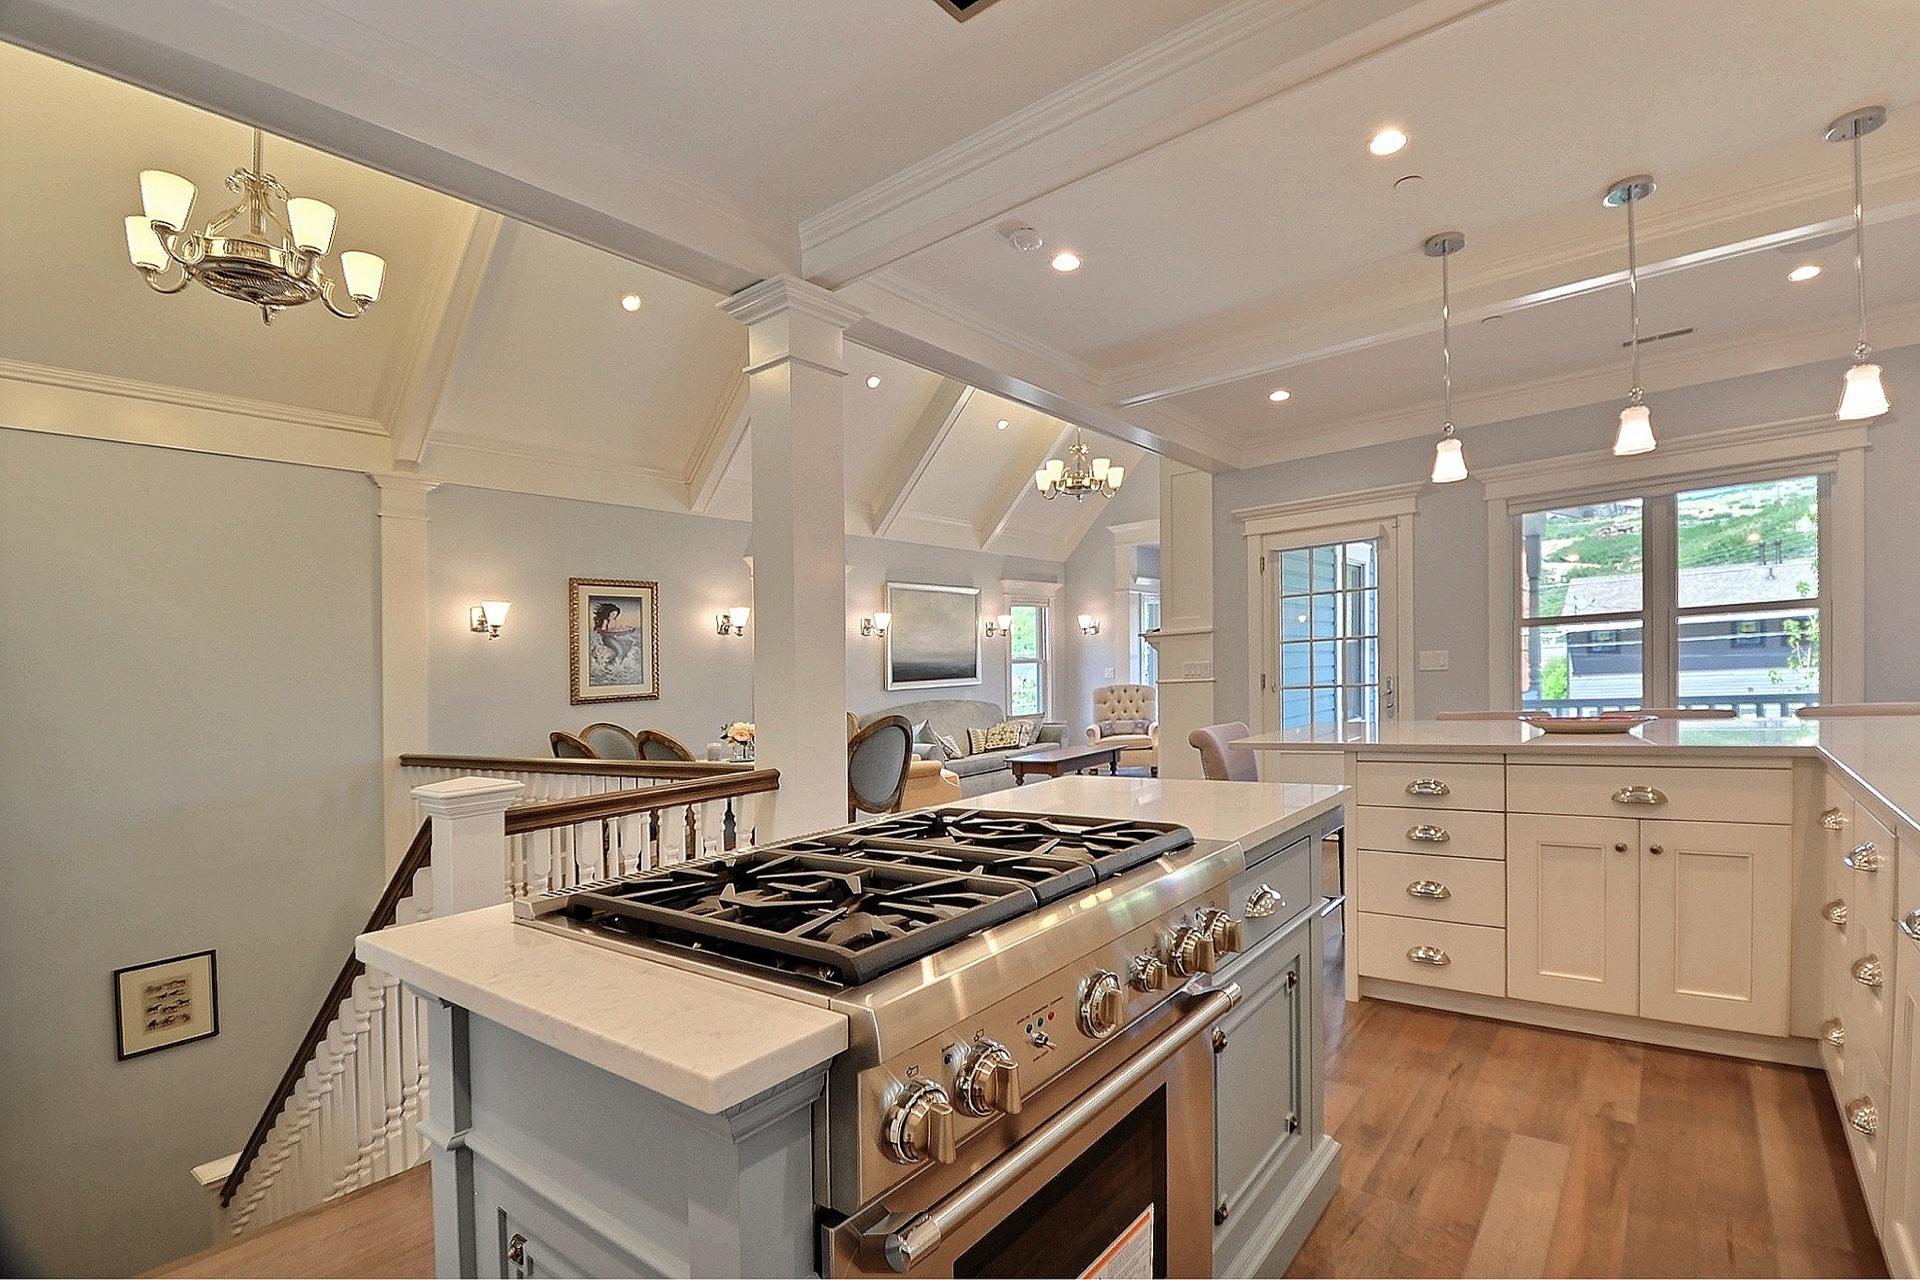 Woodside Avenue, kitchen - architectural design by Elliott Workgroup